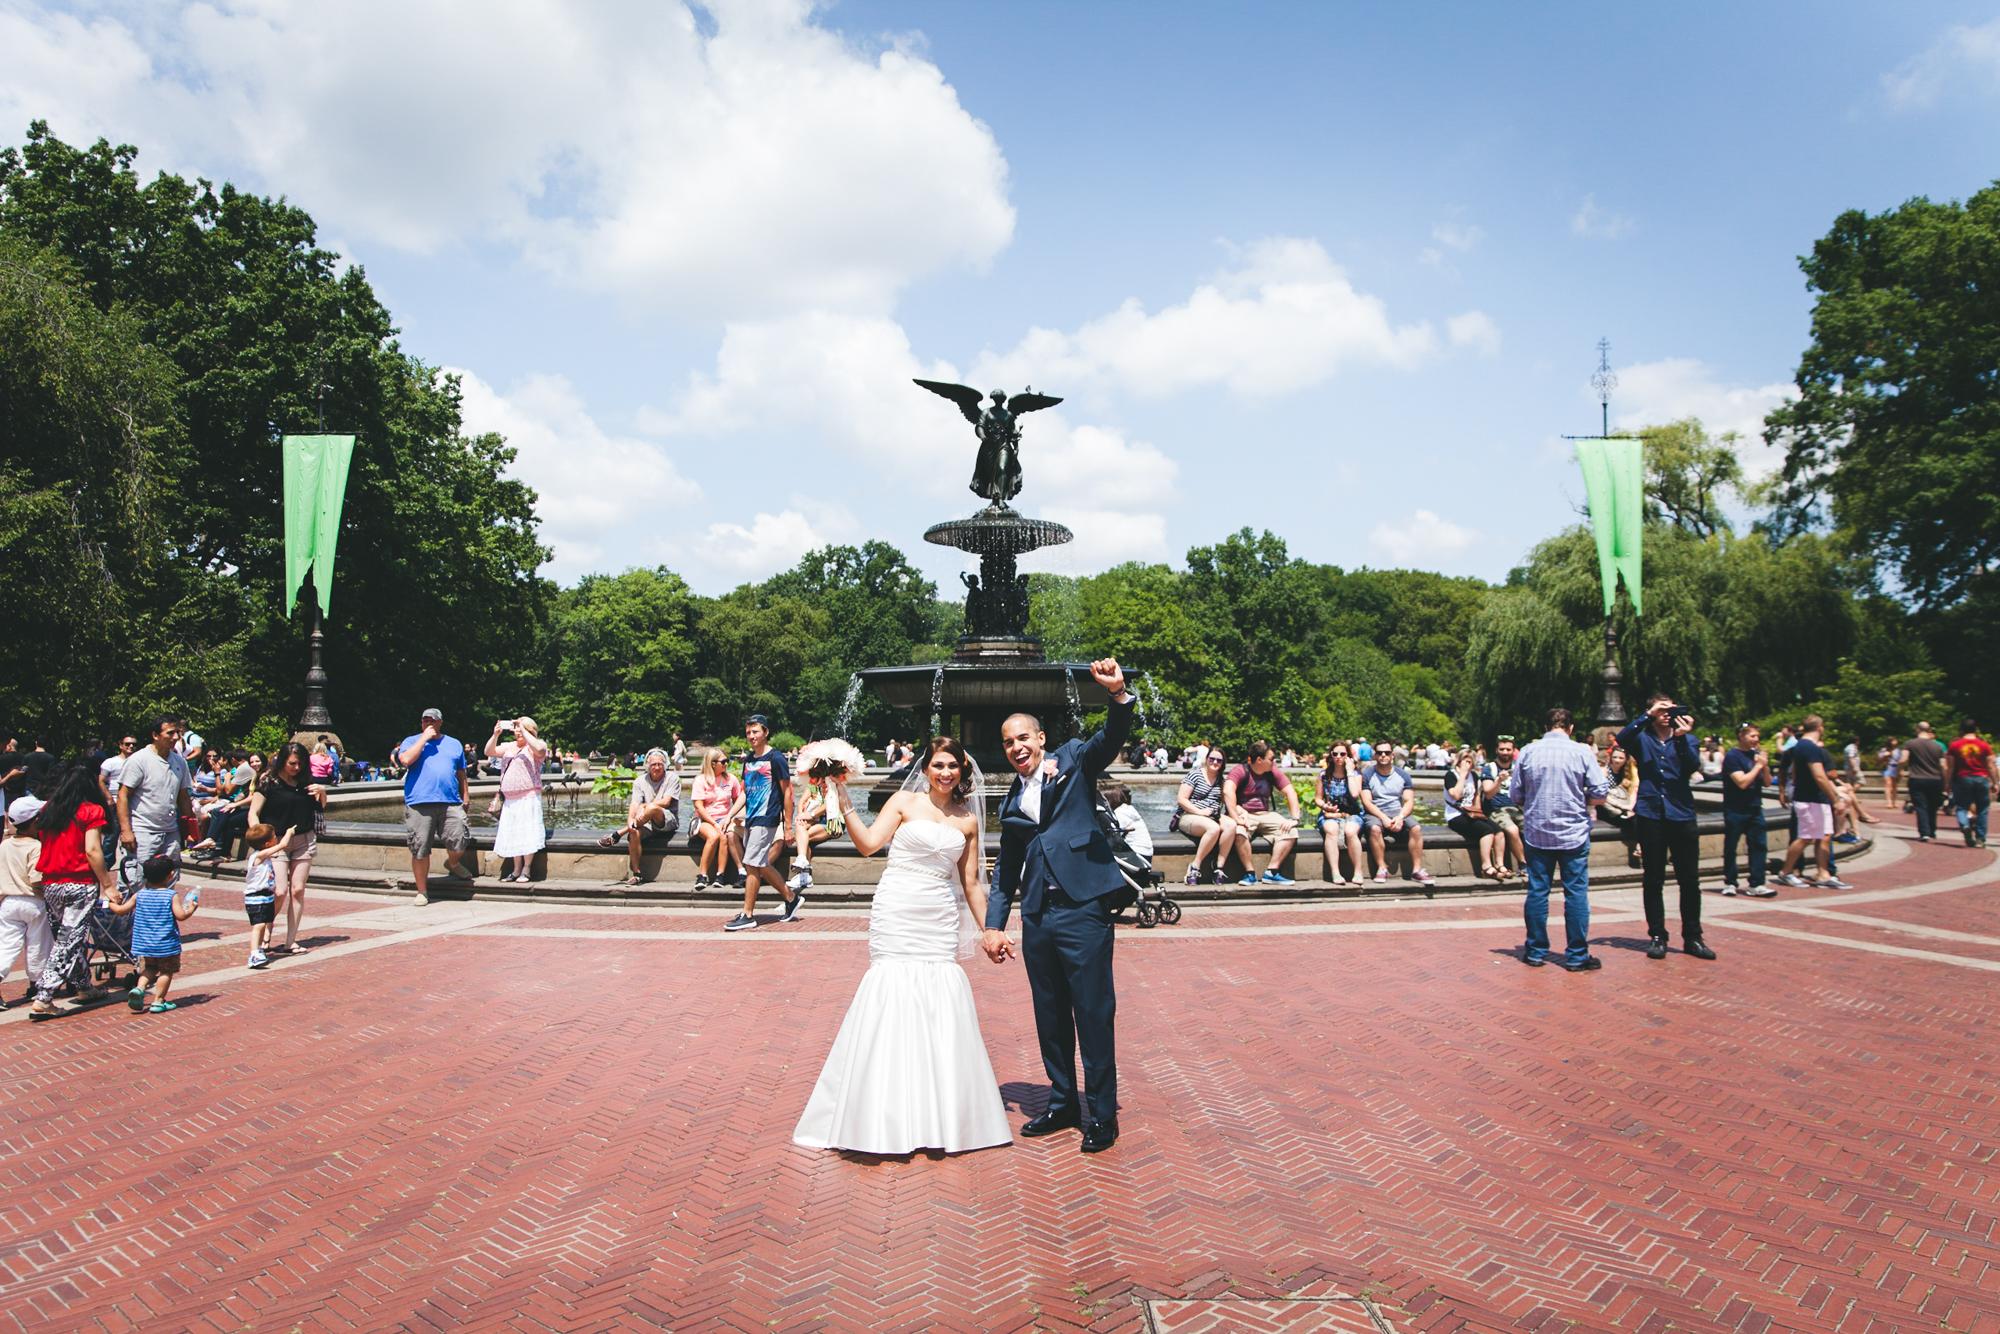 PriscillaJeffrey-Central-Park-Wedding-Elopement-Photography-NYC-30.jpg